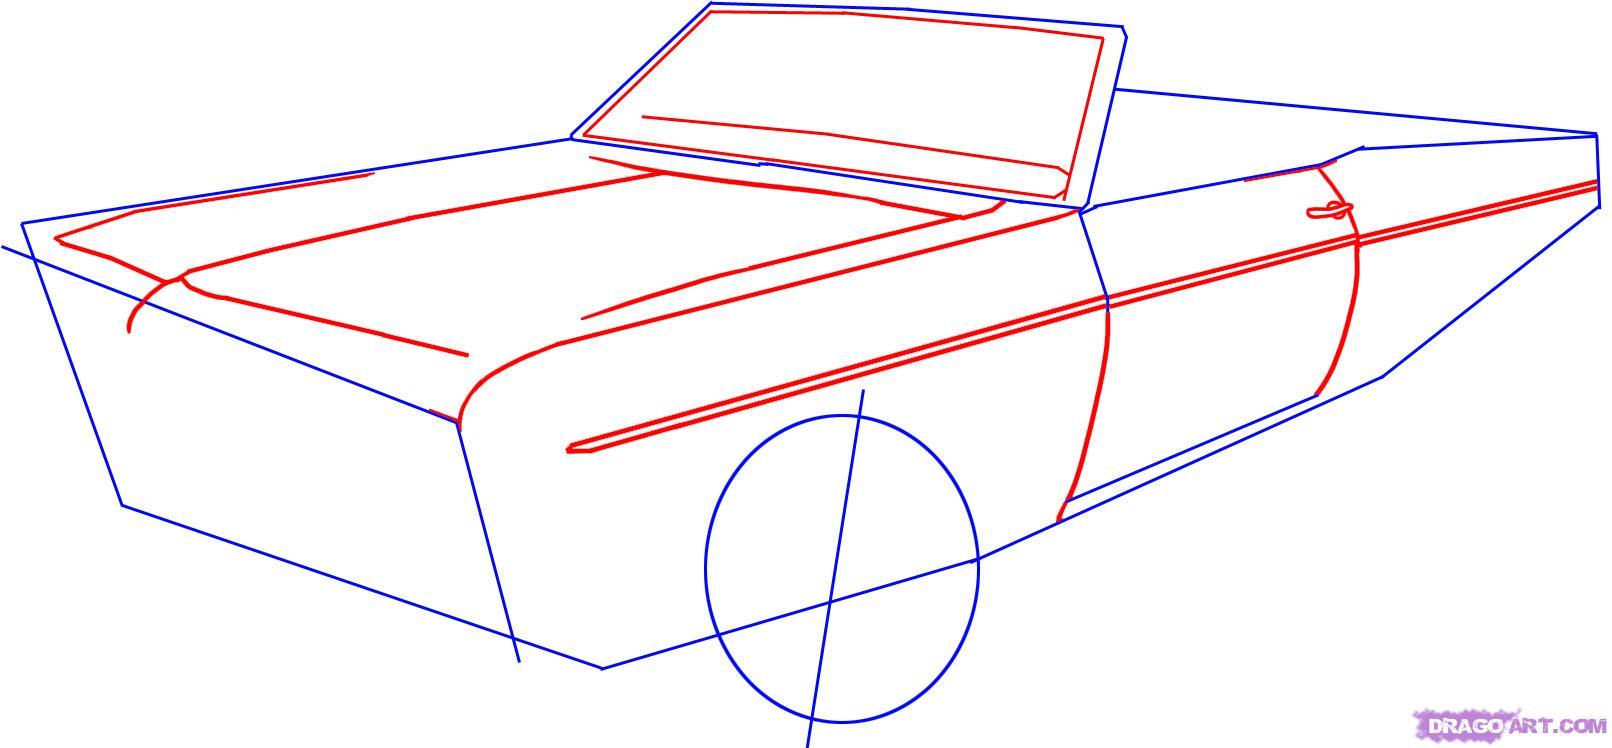 Drawn vehicle lowride car  car 2 to Draw